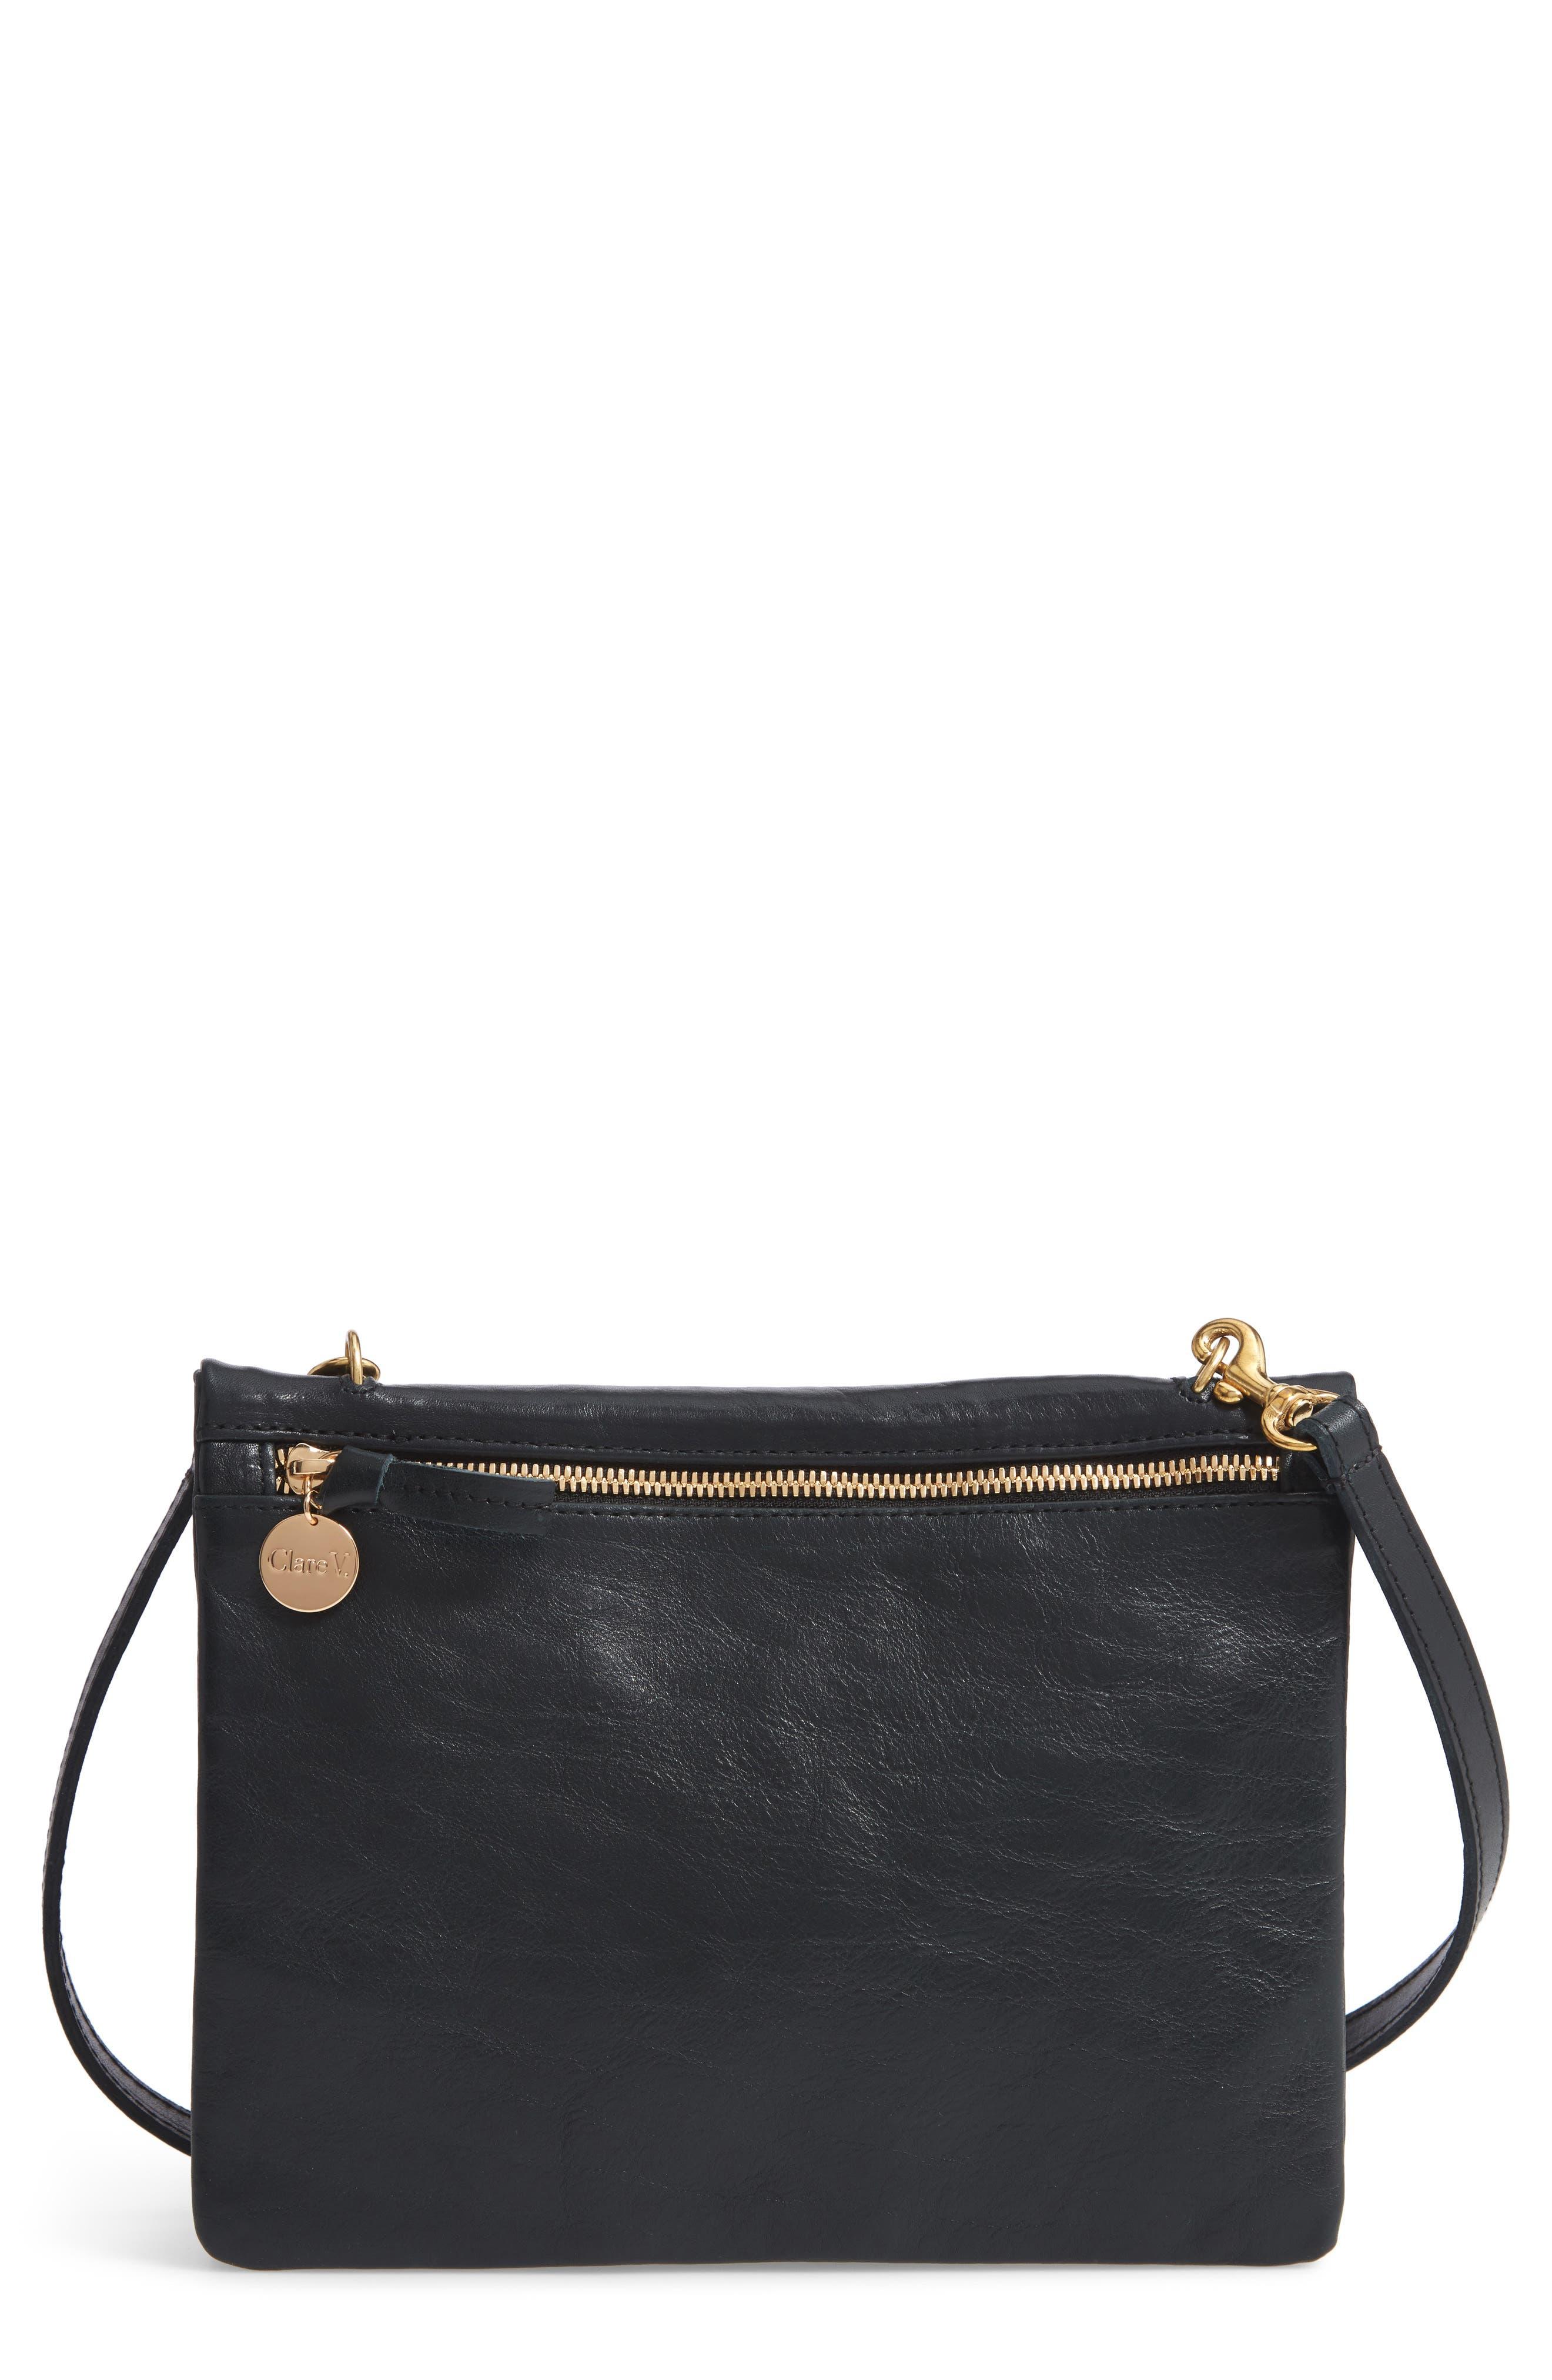 CLARE V Jumelle Leather Crossbody Bag - Black in Black Rustic